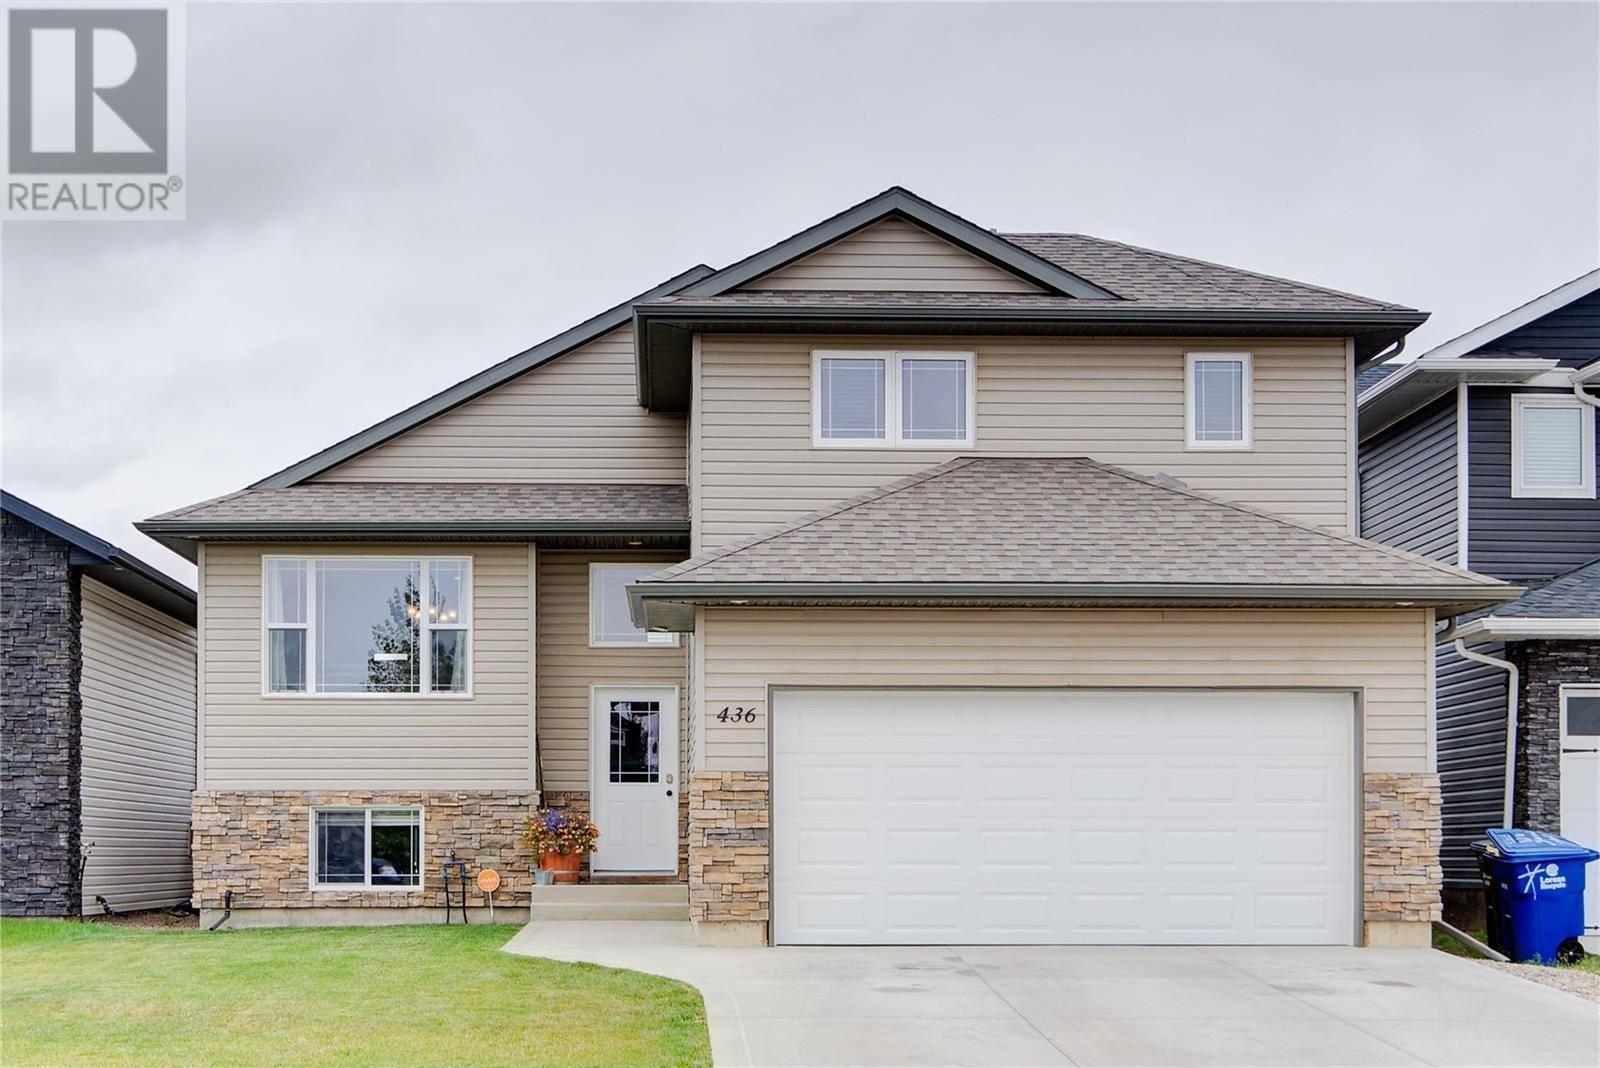 House for sale at 436 Evergreen Blvd Saskatoon Saskatchewan - MLS: SK792945